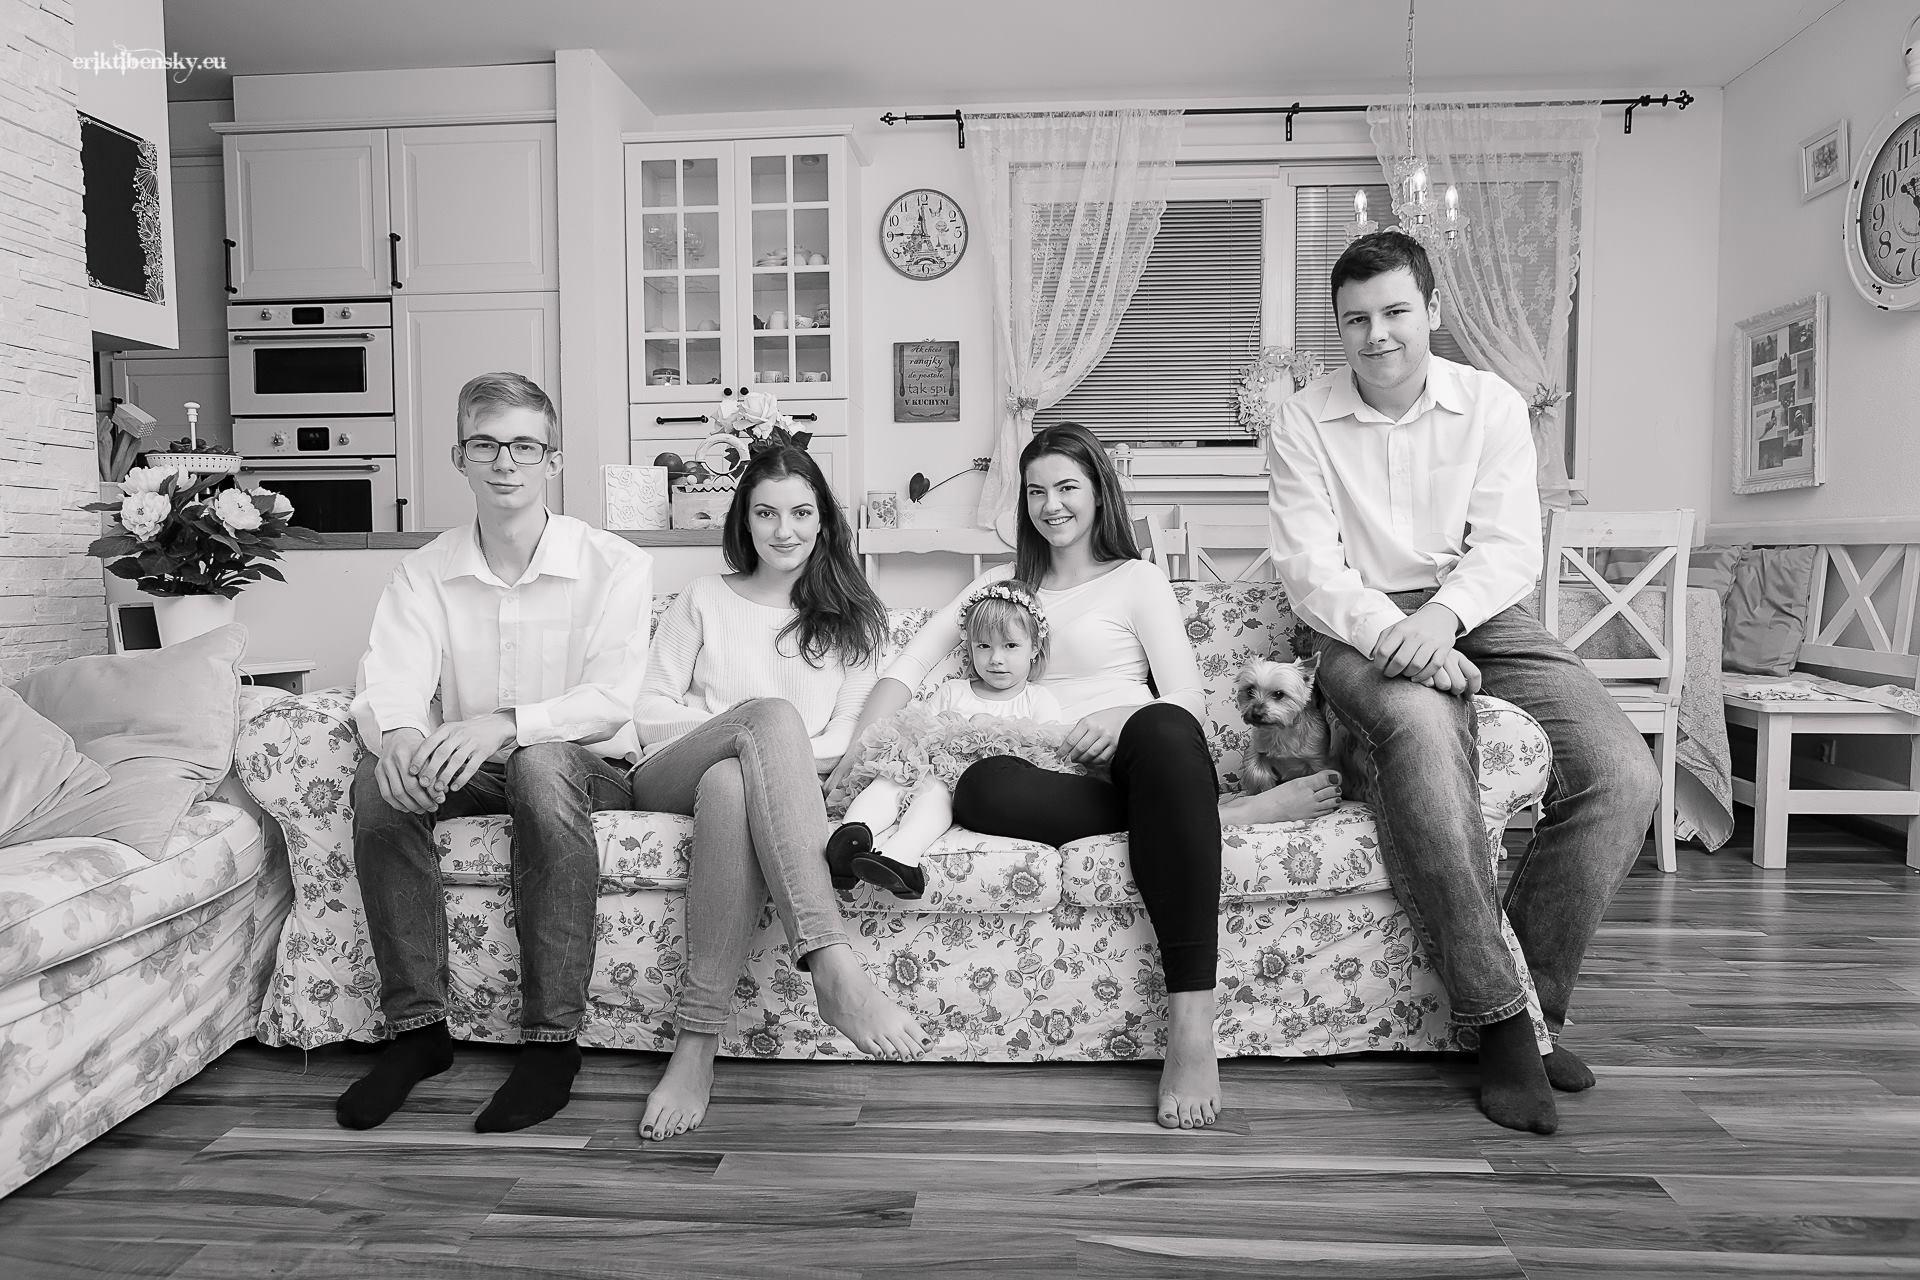 eriktibensky-eu-fotograf-home-photo-family-rodina-kids-deti-1000a